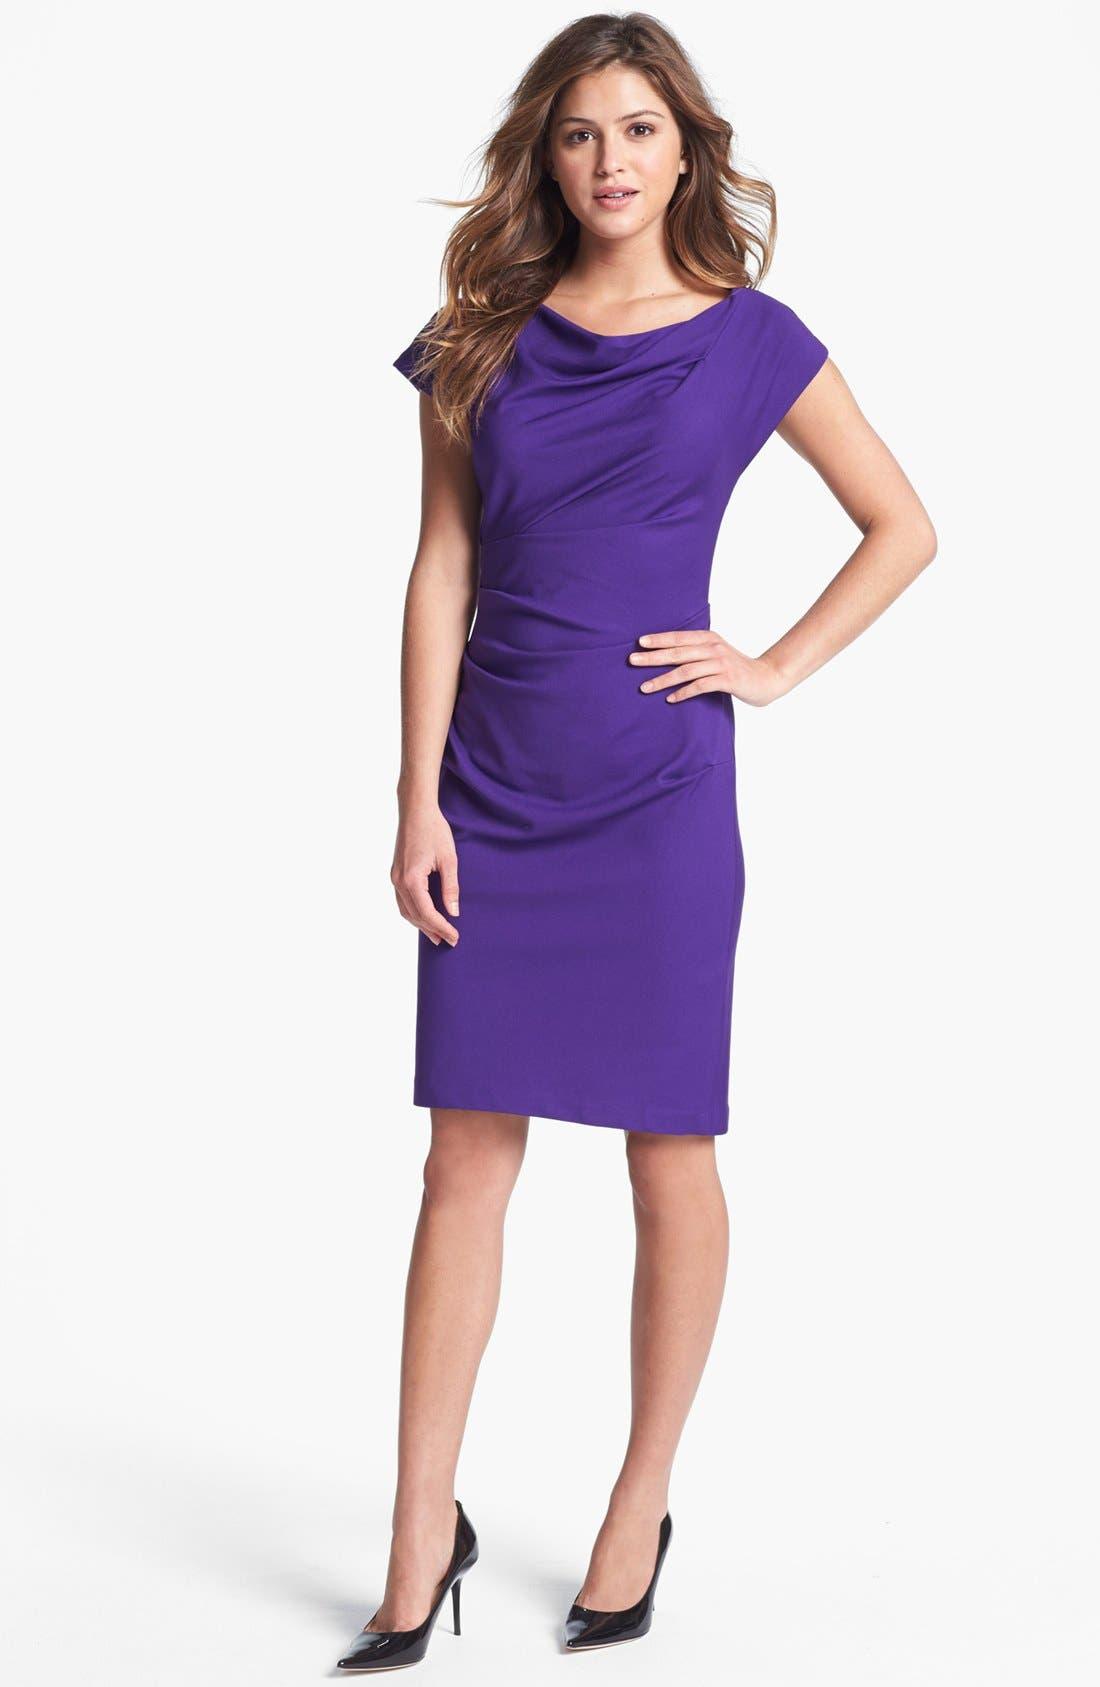 Alternate Image 1 Selected - Ivy & Blu Cowl Neck Sheath Dress